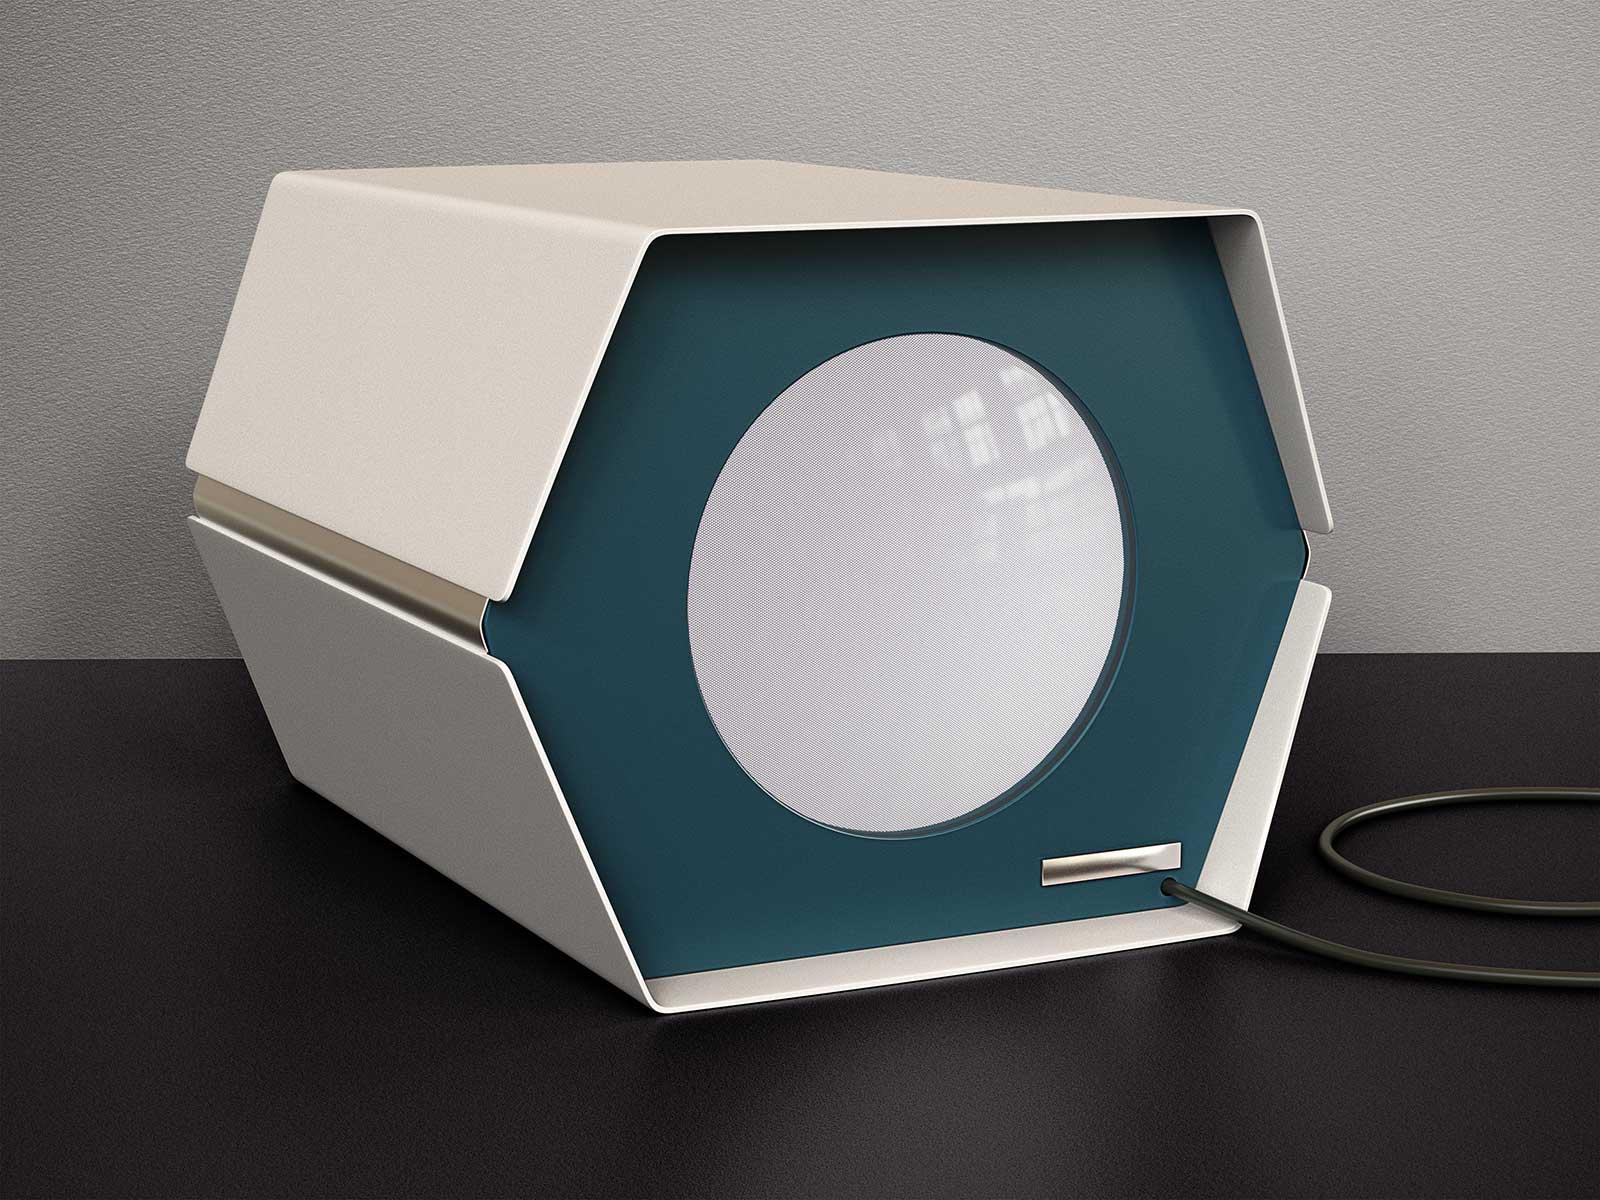 Monitor I 01, CGI Fine Art Print, 39 x 52 cm, 2013